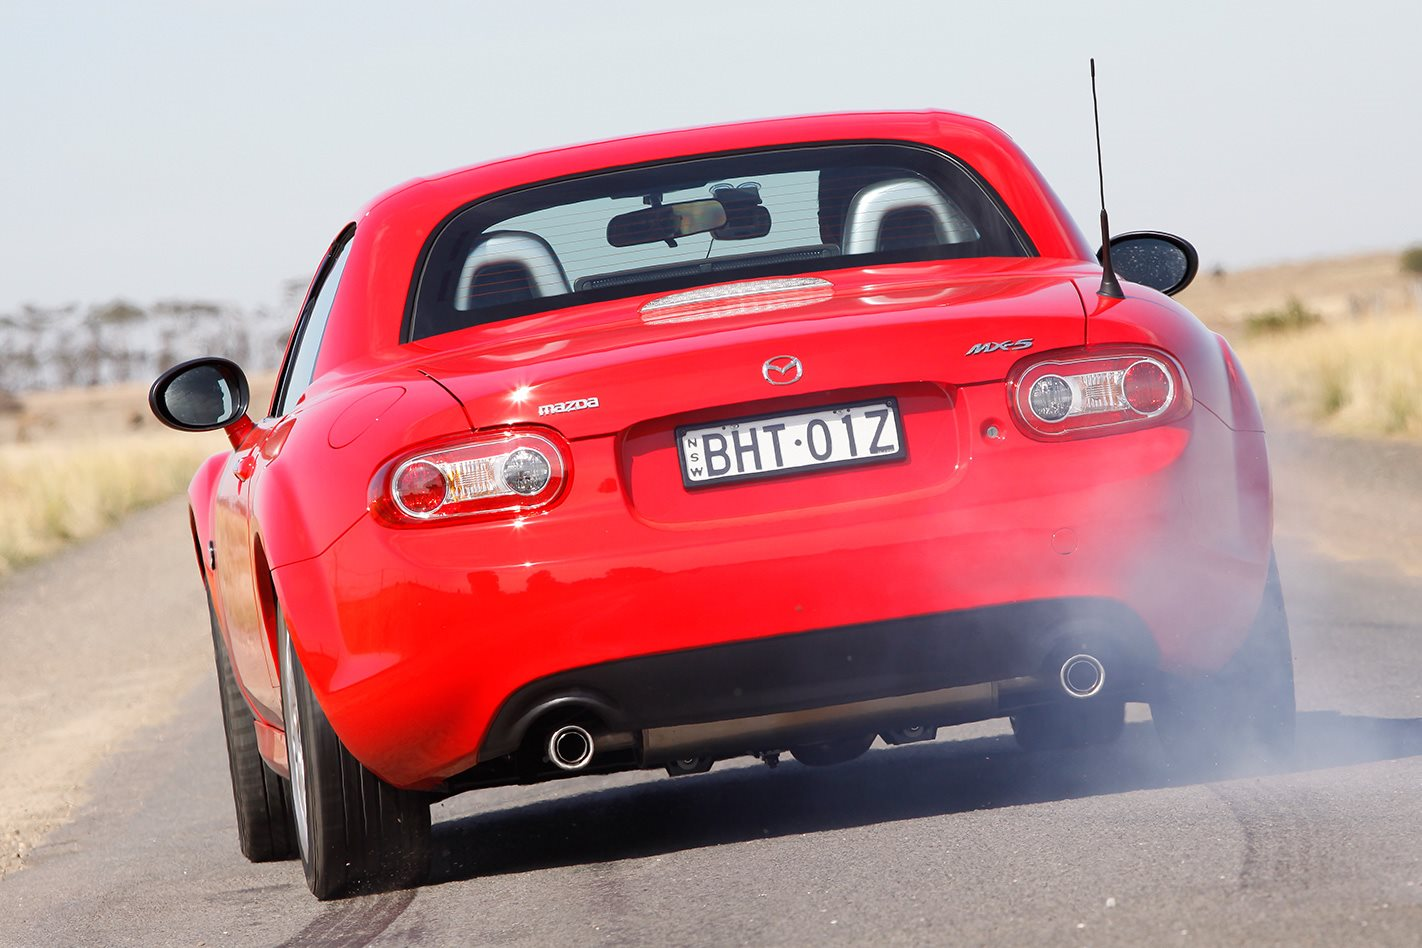 Mazda NC MX-5 rear drive